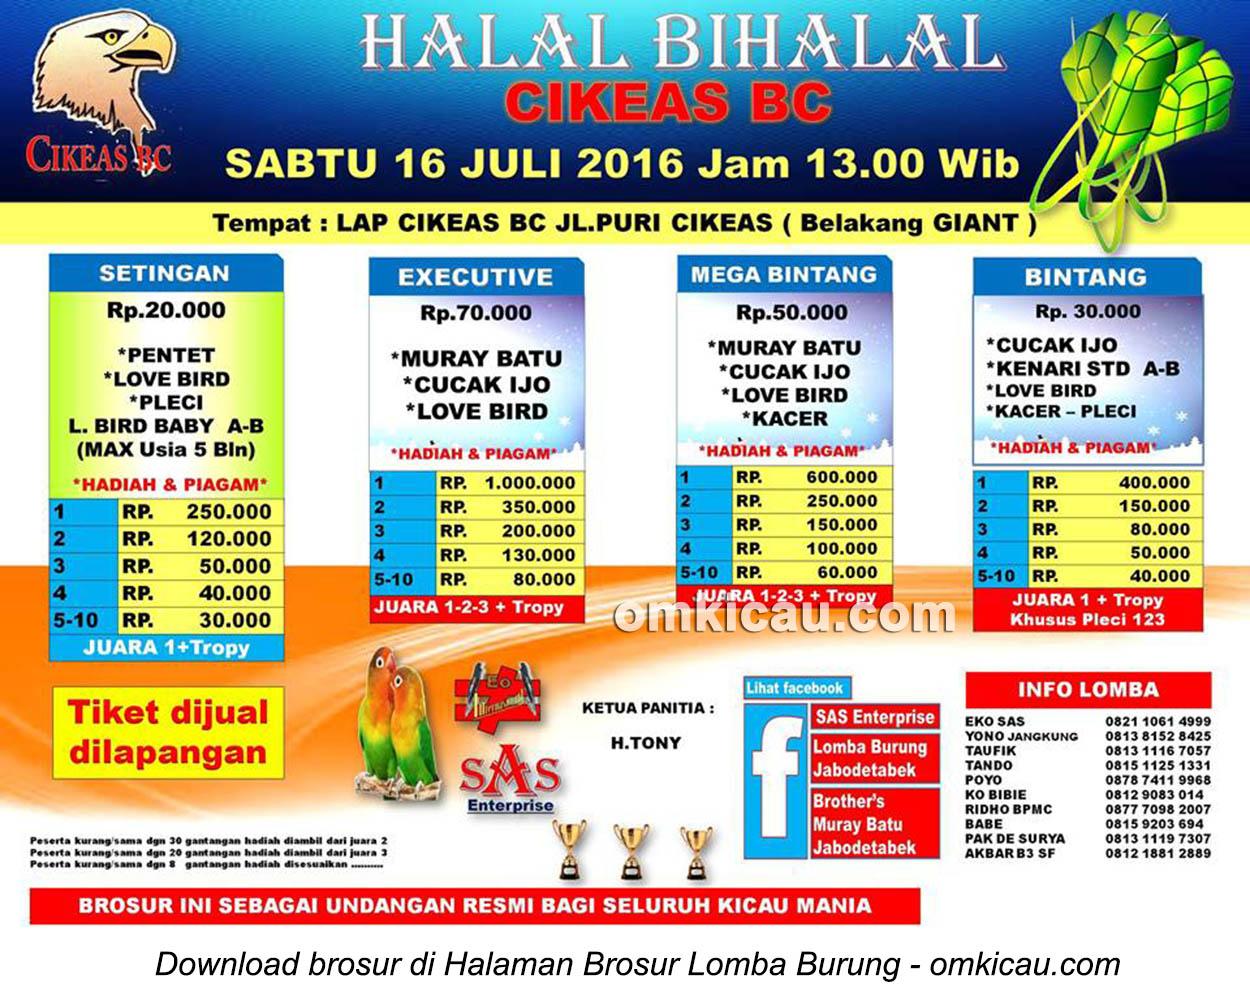 Brosur Latpres Halal Bihalal Cikeas BC, Cikeas, 16 Juli 2016